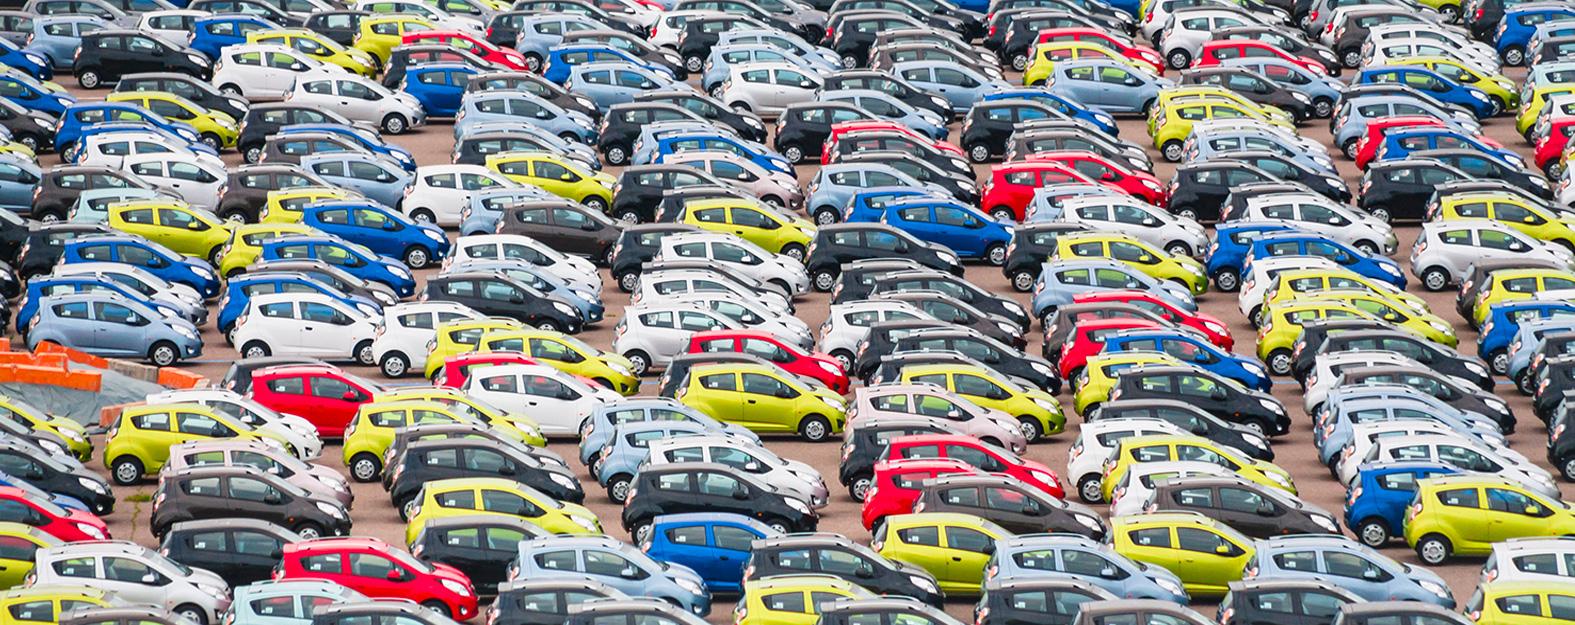 optimisation-stationnement-parking-hesion